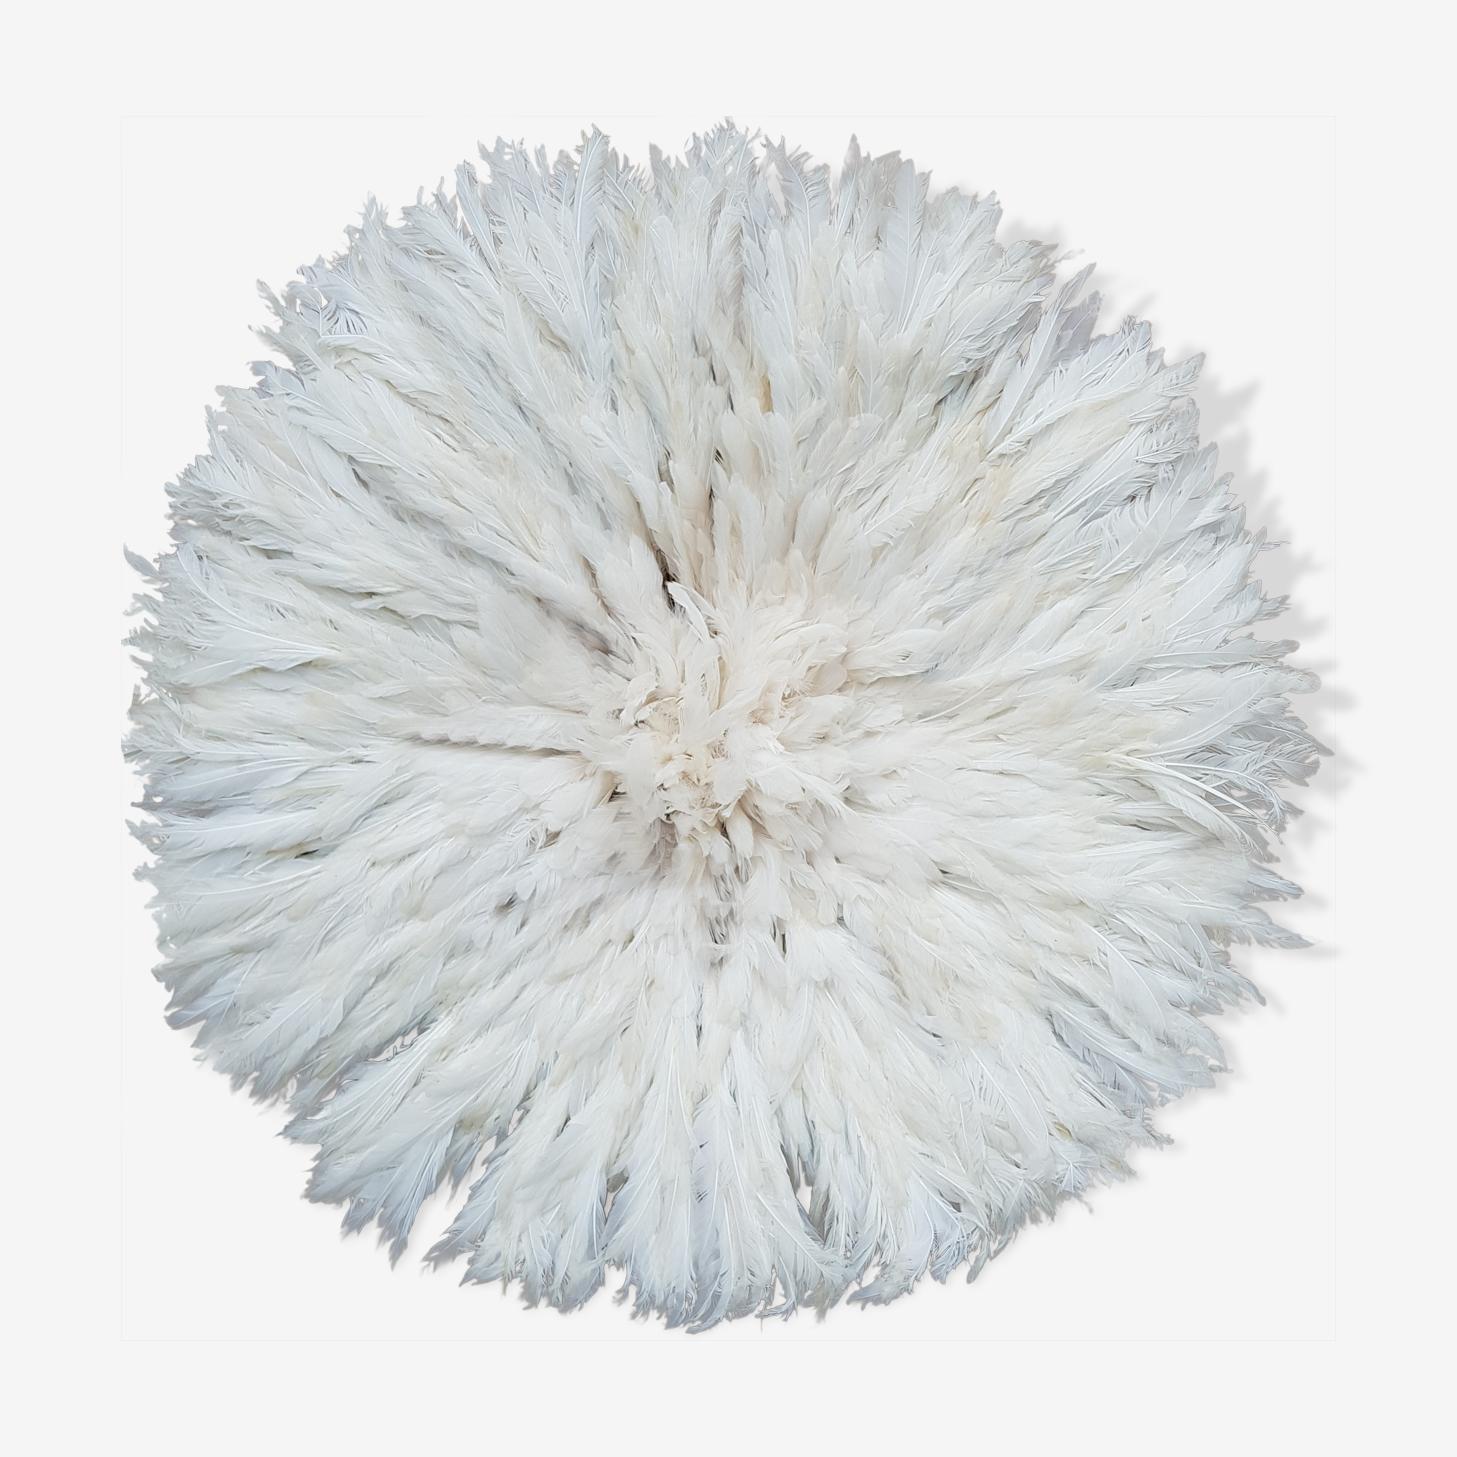 Juju hat blanc 70-75cm